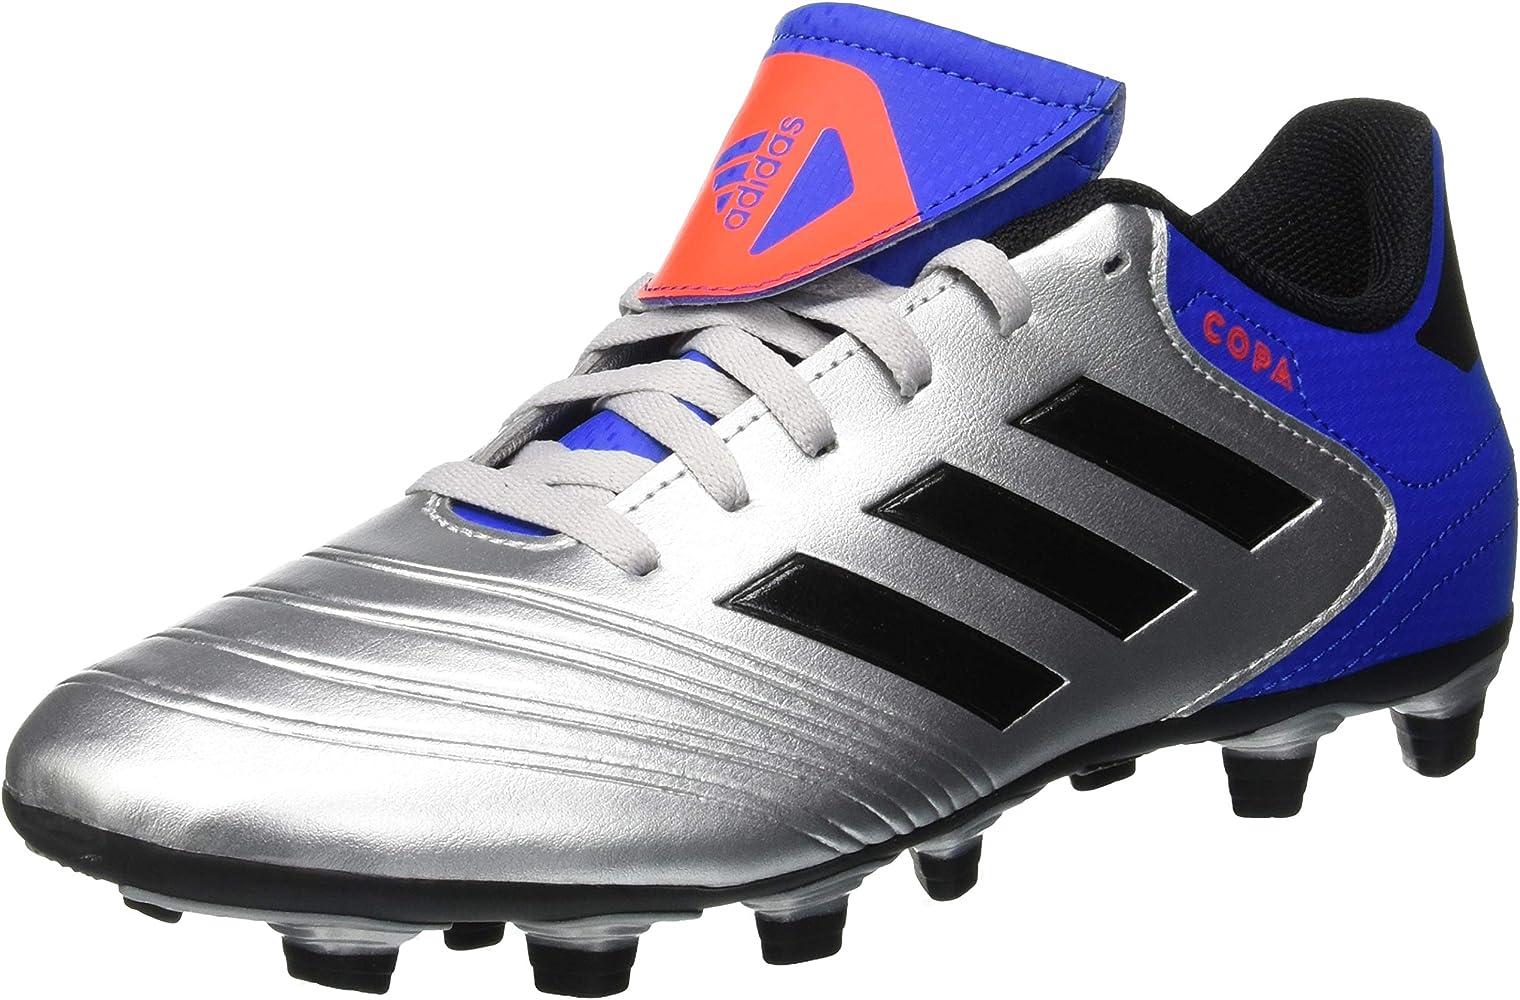 Chollo Botas de fútbol Adidas Copa 18.4 FXG para hombre por